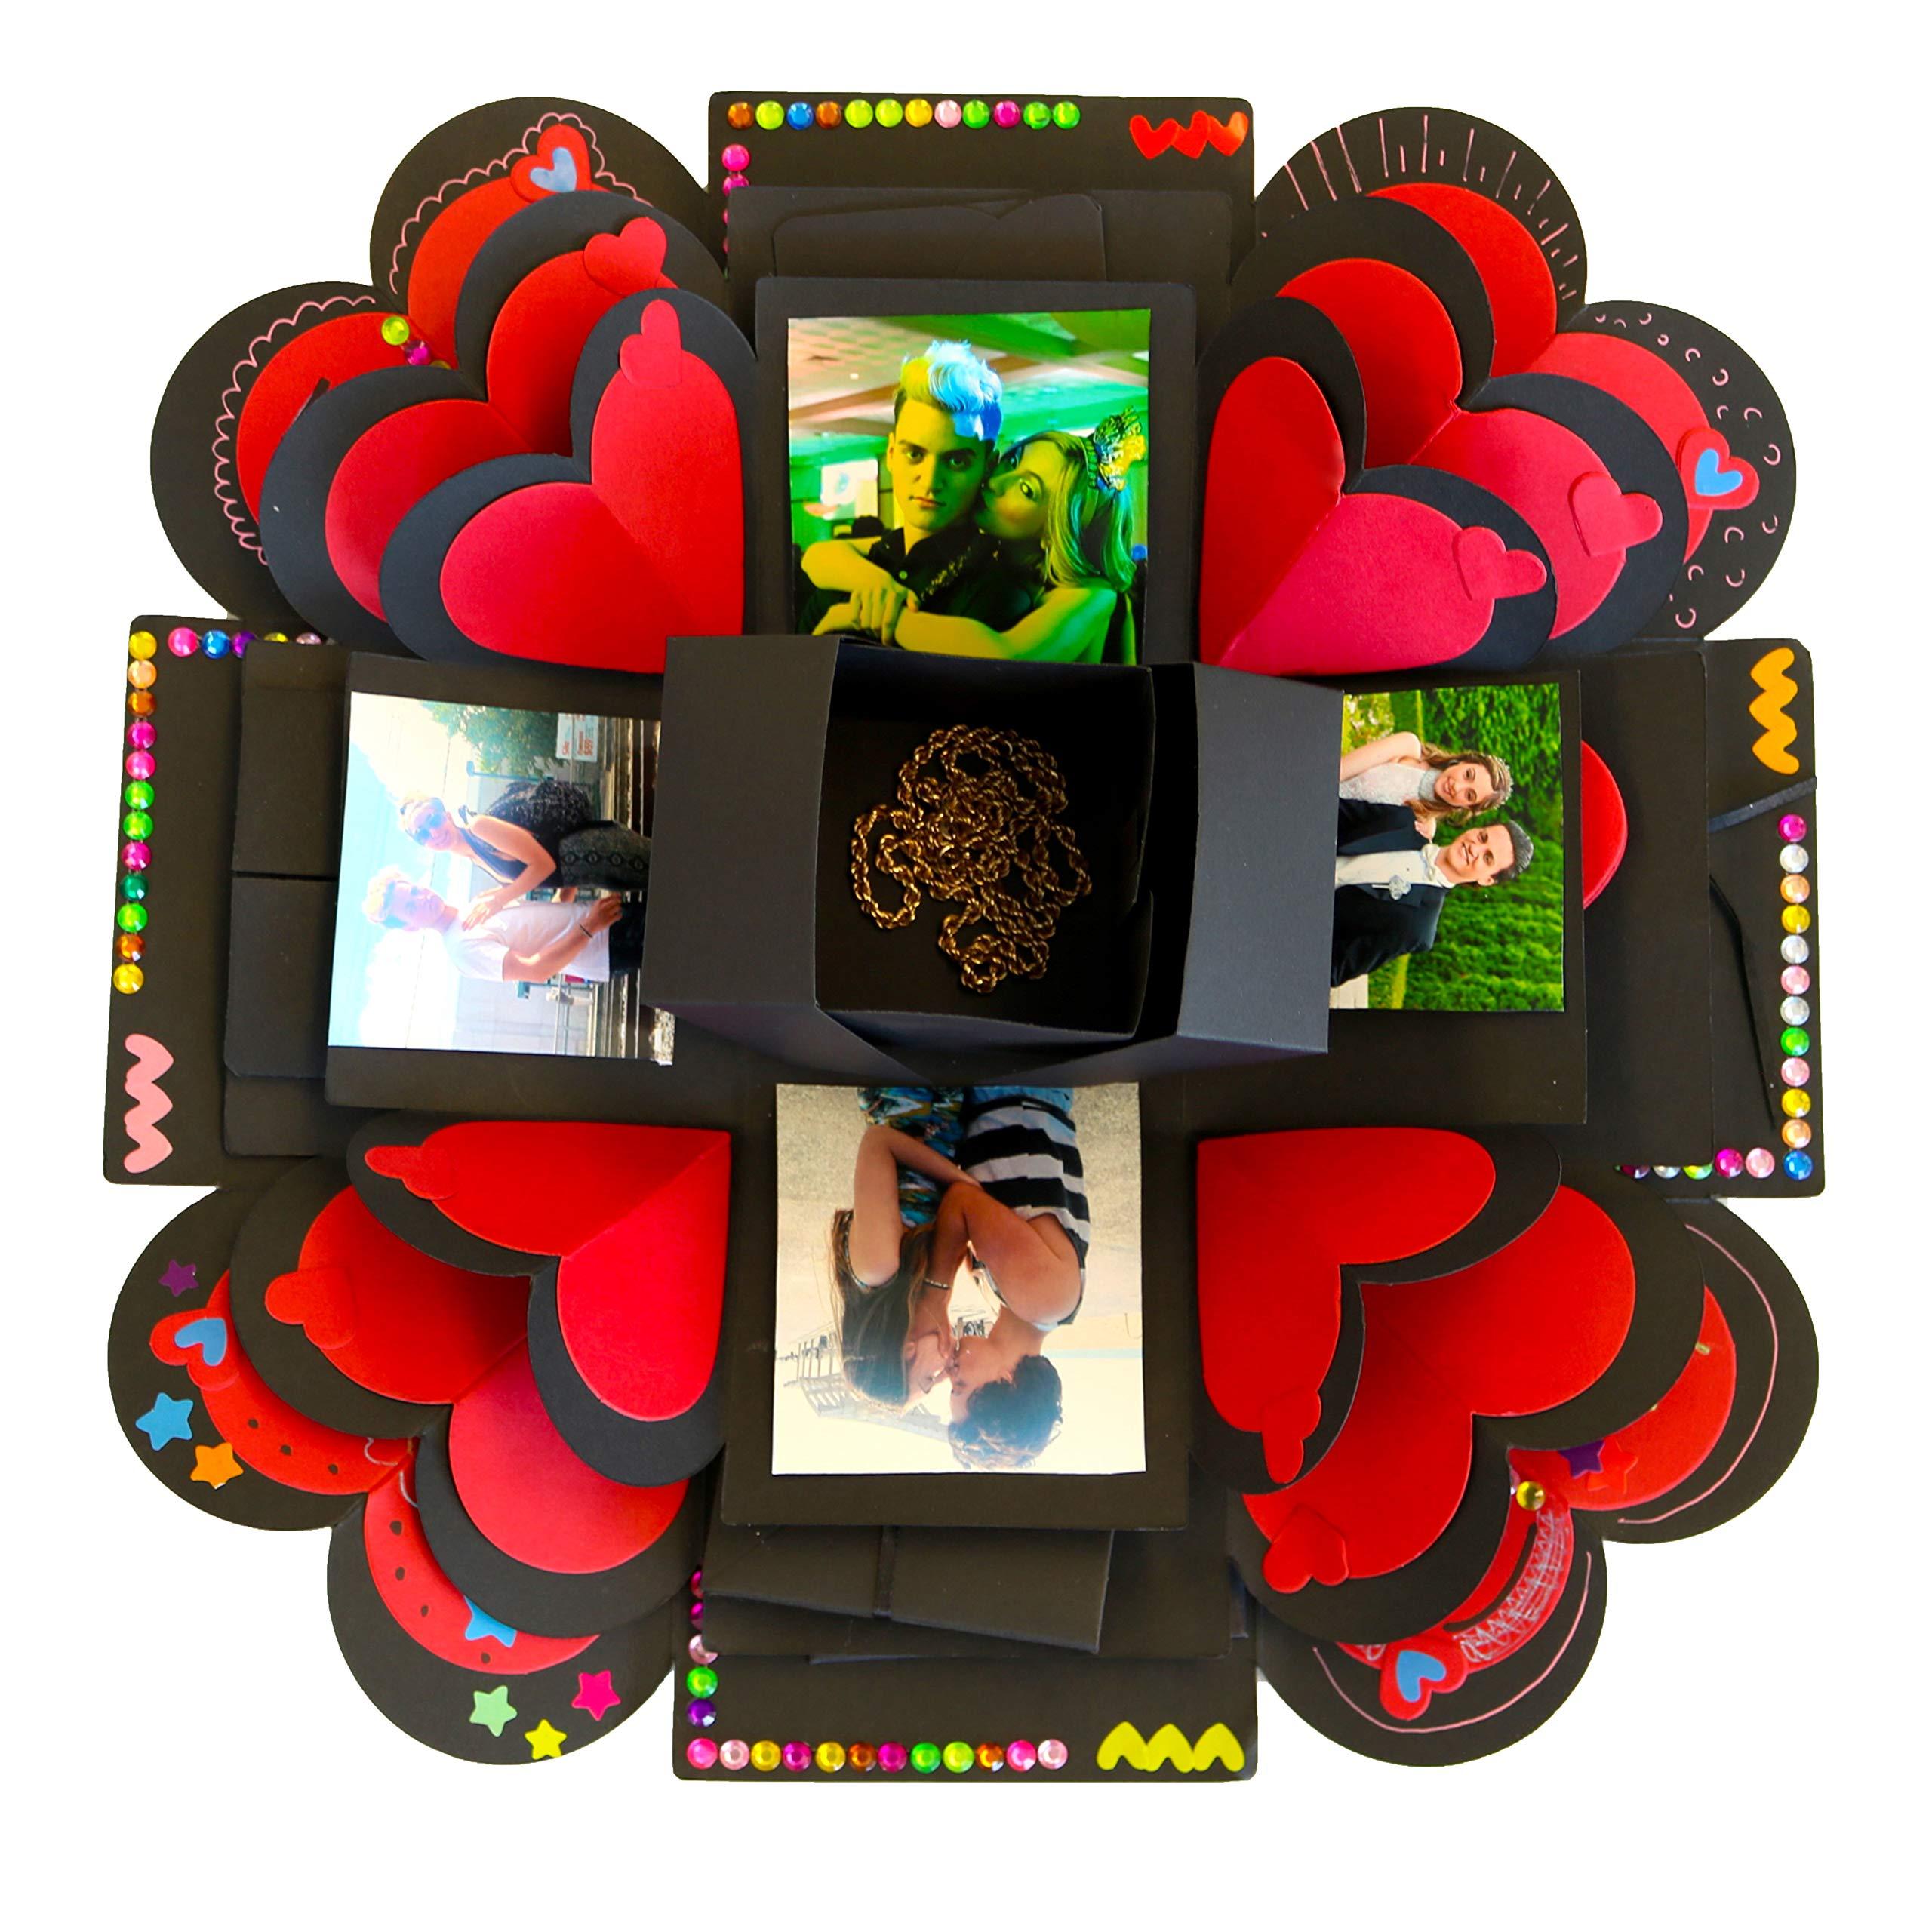 3 Layer Explosion Gift Box Set|DIY Surprise Photo Album|Creative Scrapbook Kit with Accessories, Pens, Adhesive Tape|Gifts for Boyfriend, Girlfriend, Anniversary, Wedding, Valentines Day, Birthdays